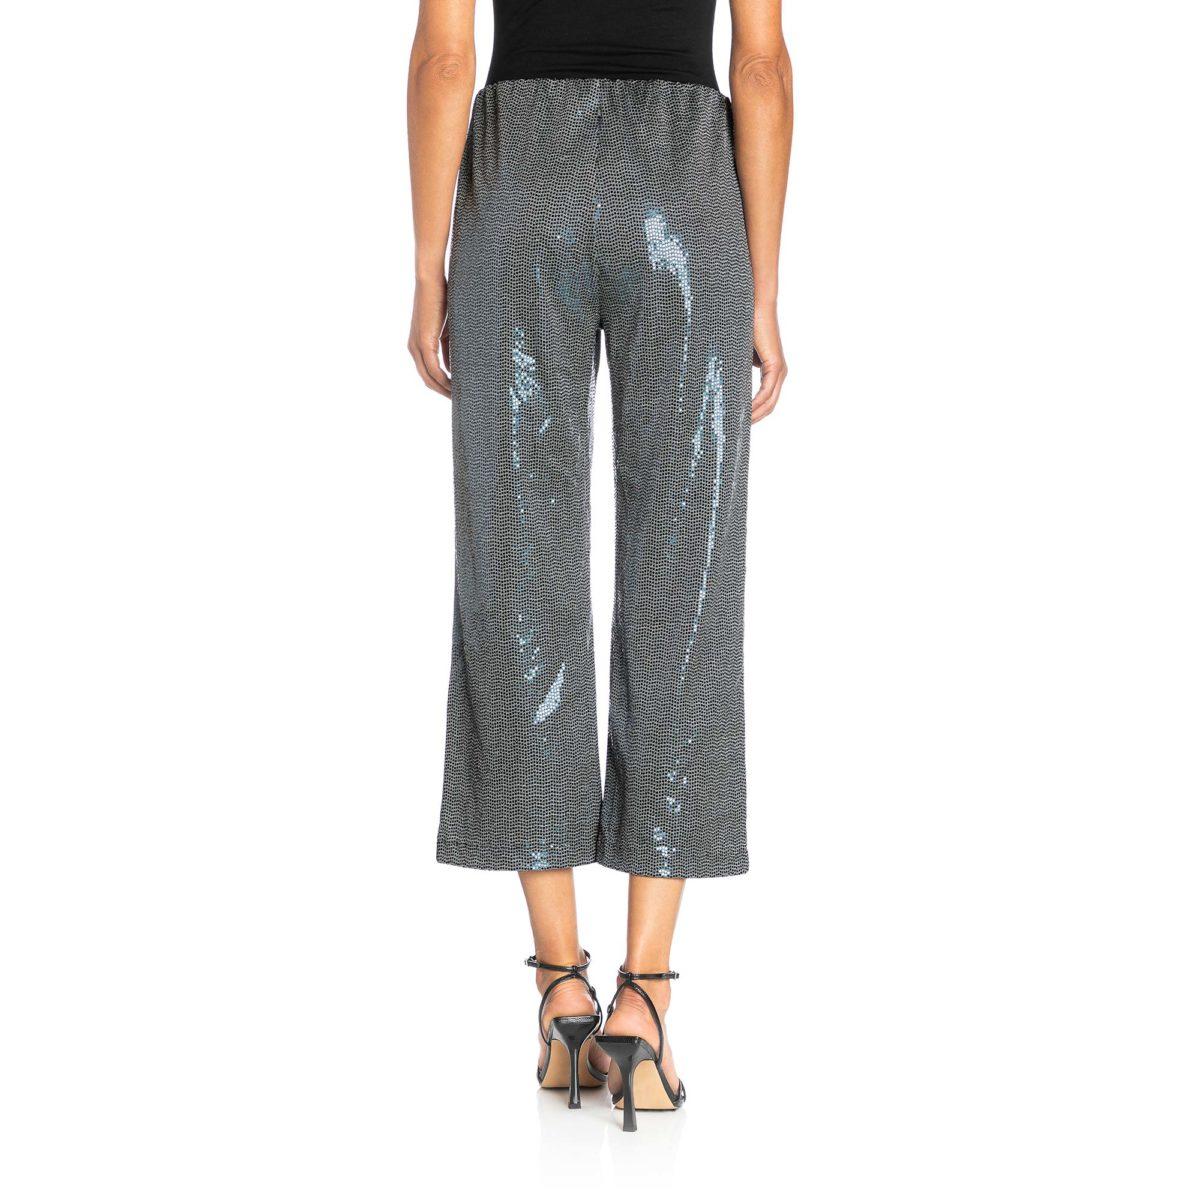 Pantalone Classic con paillettes